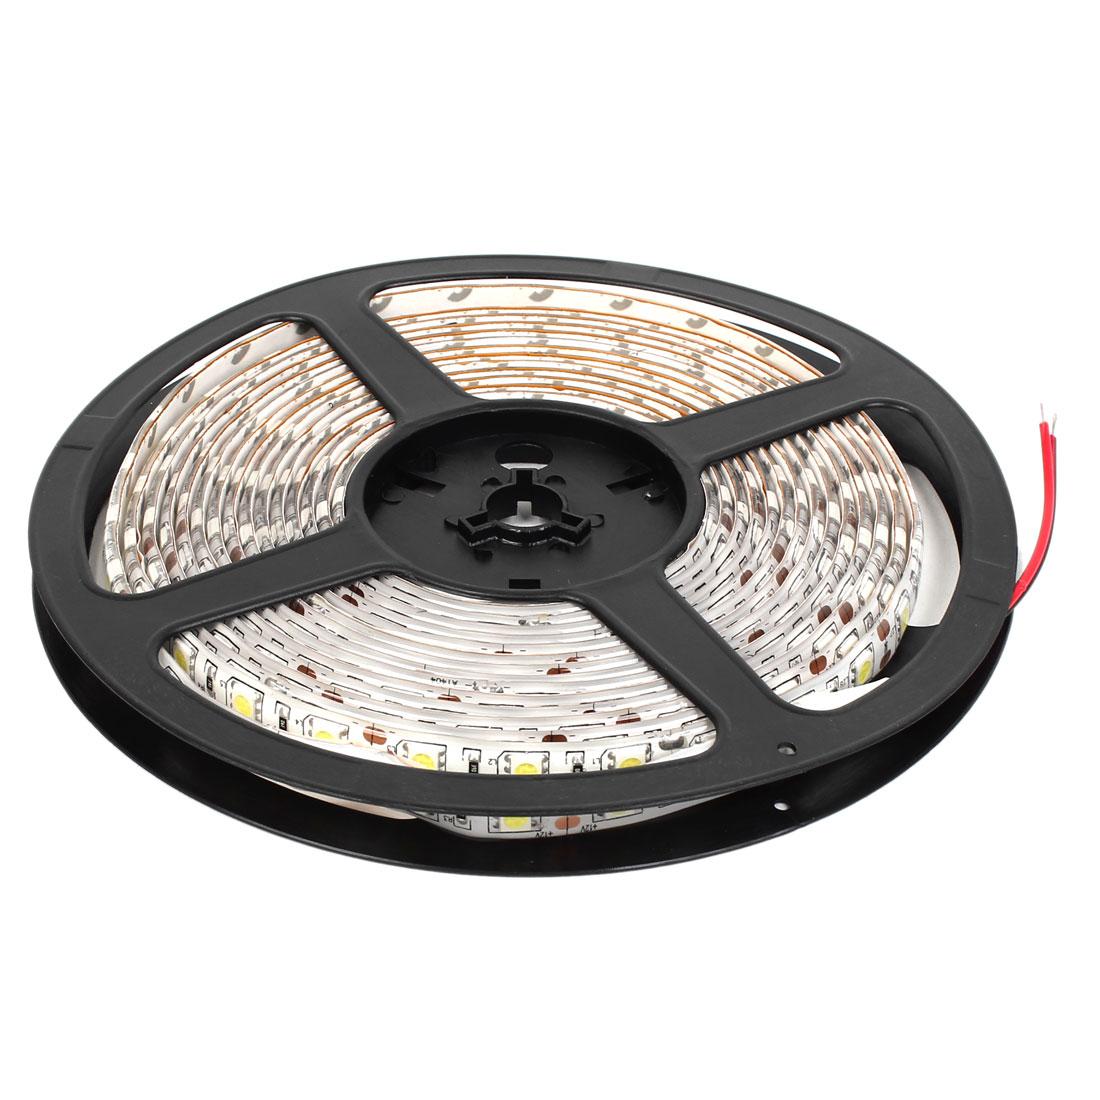 Indoor DC 12V Pure White 5050 SMD 300 LEDs Waterproof Flexible LED Strip Light 5M